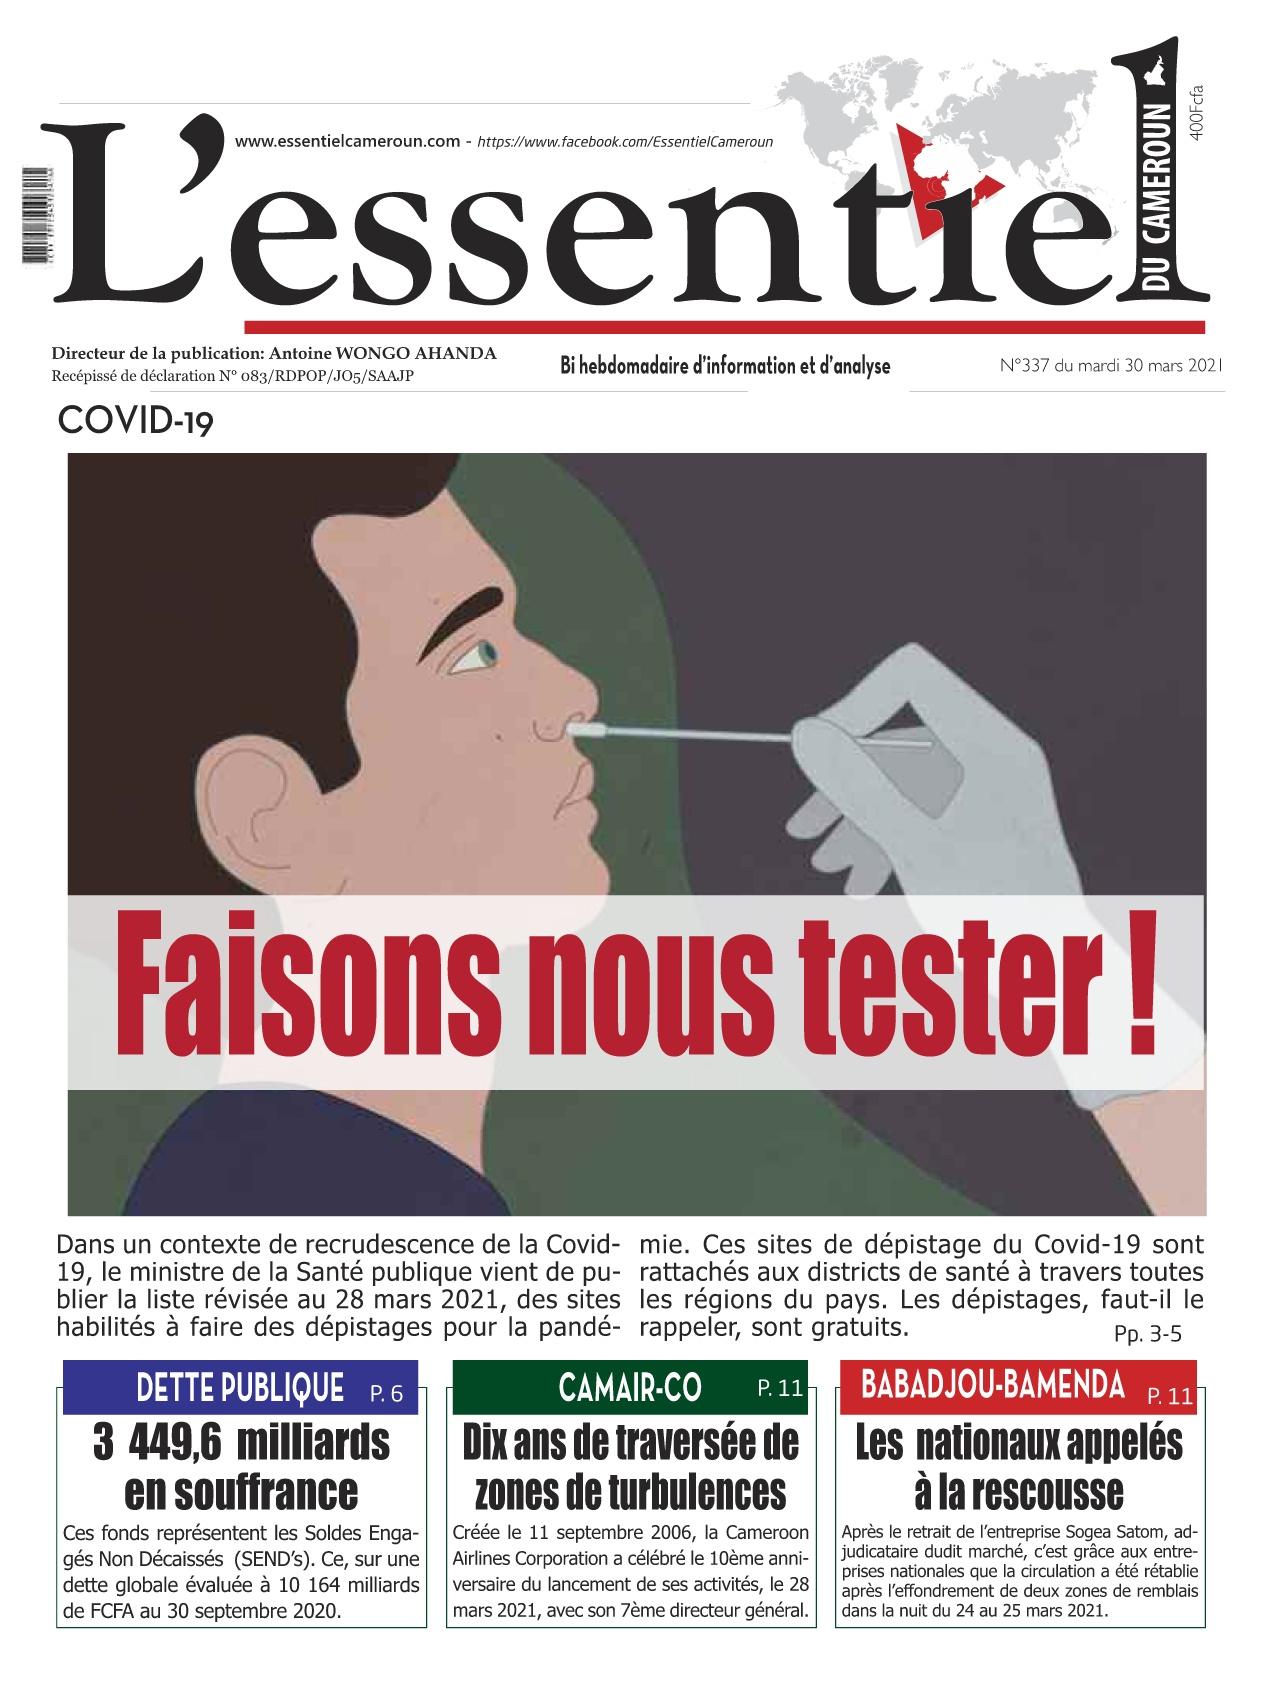 L'essentiel du Cameroun - 30/03/2021